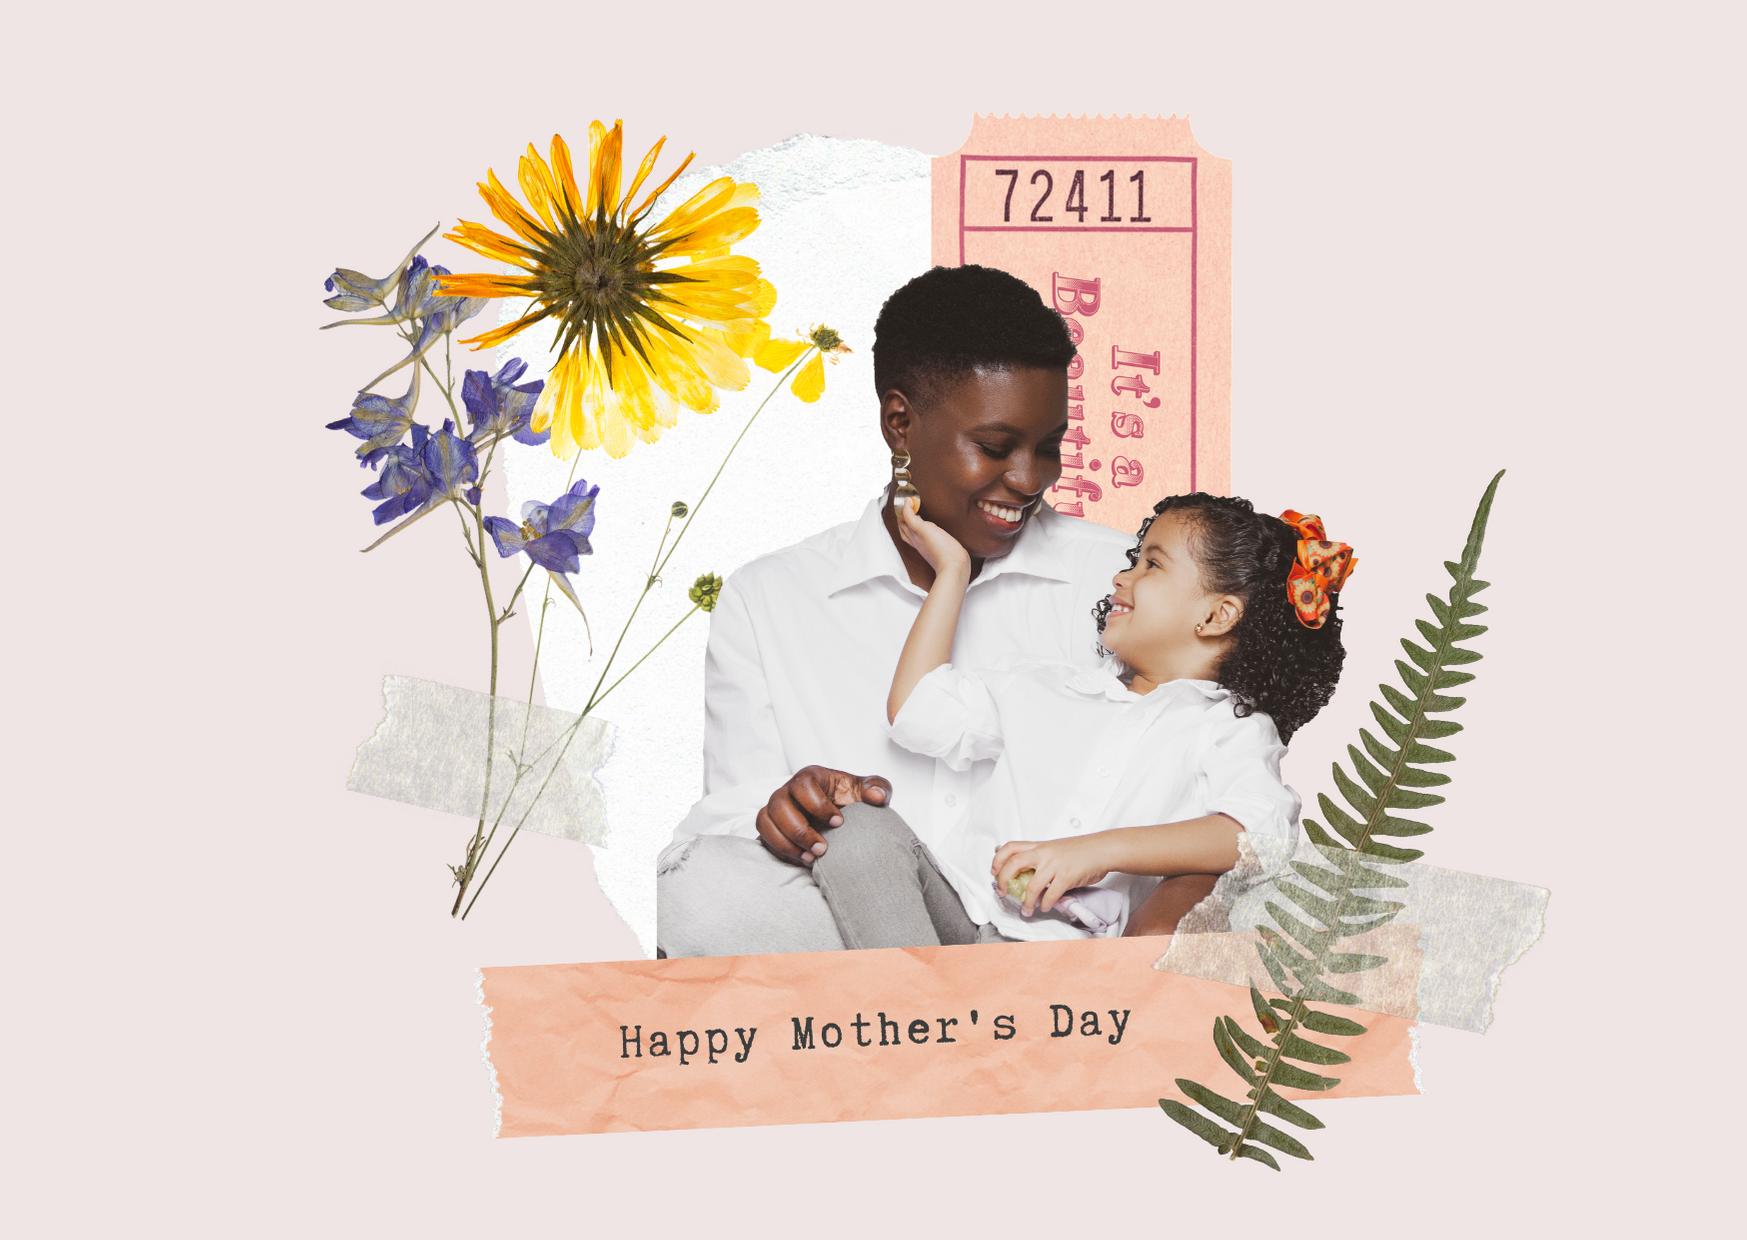 Mother's Day 2021 - Bonus Rewards This Weekend!